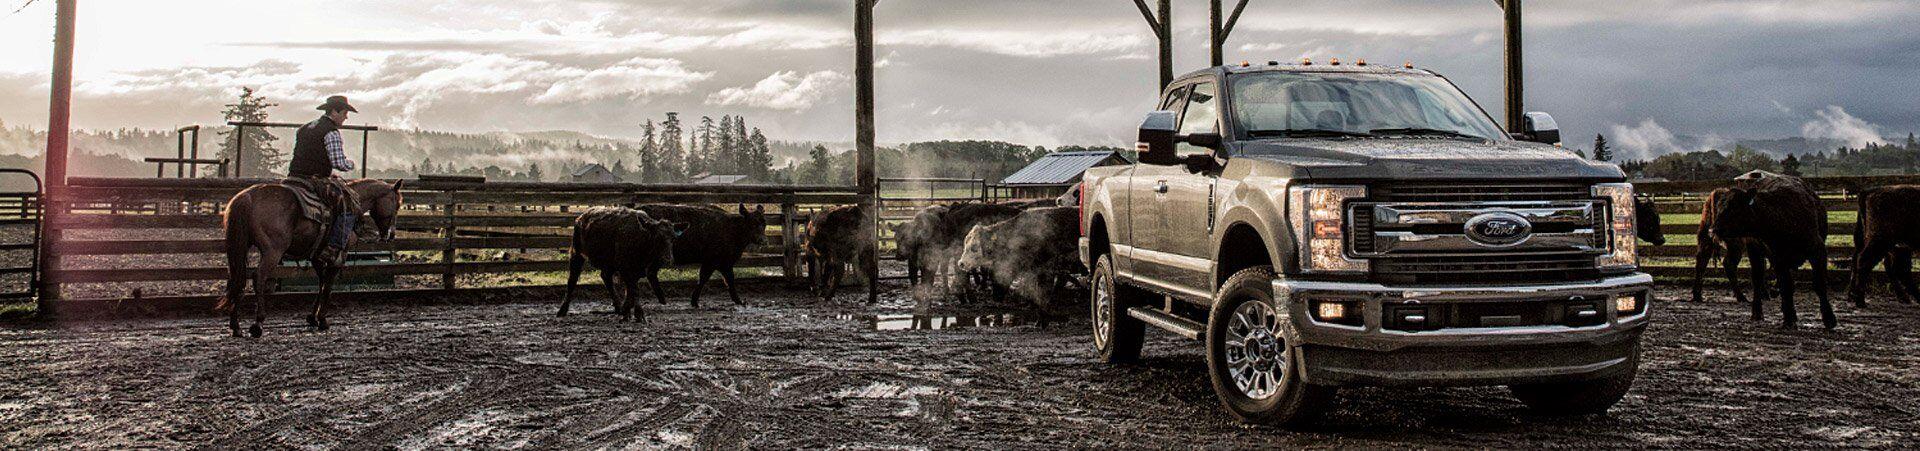 Used Diesel Trucks DFW | North Texas Truck Stop in Mansfield, TX